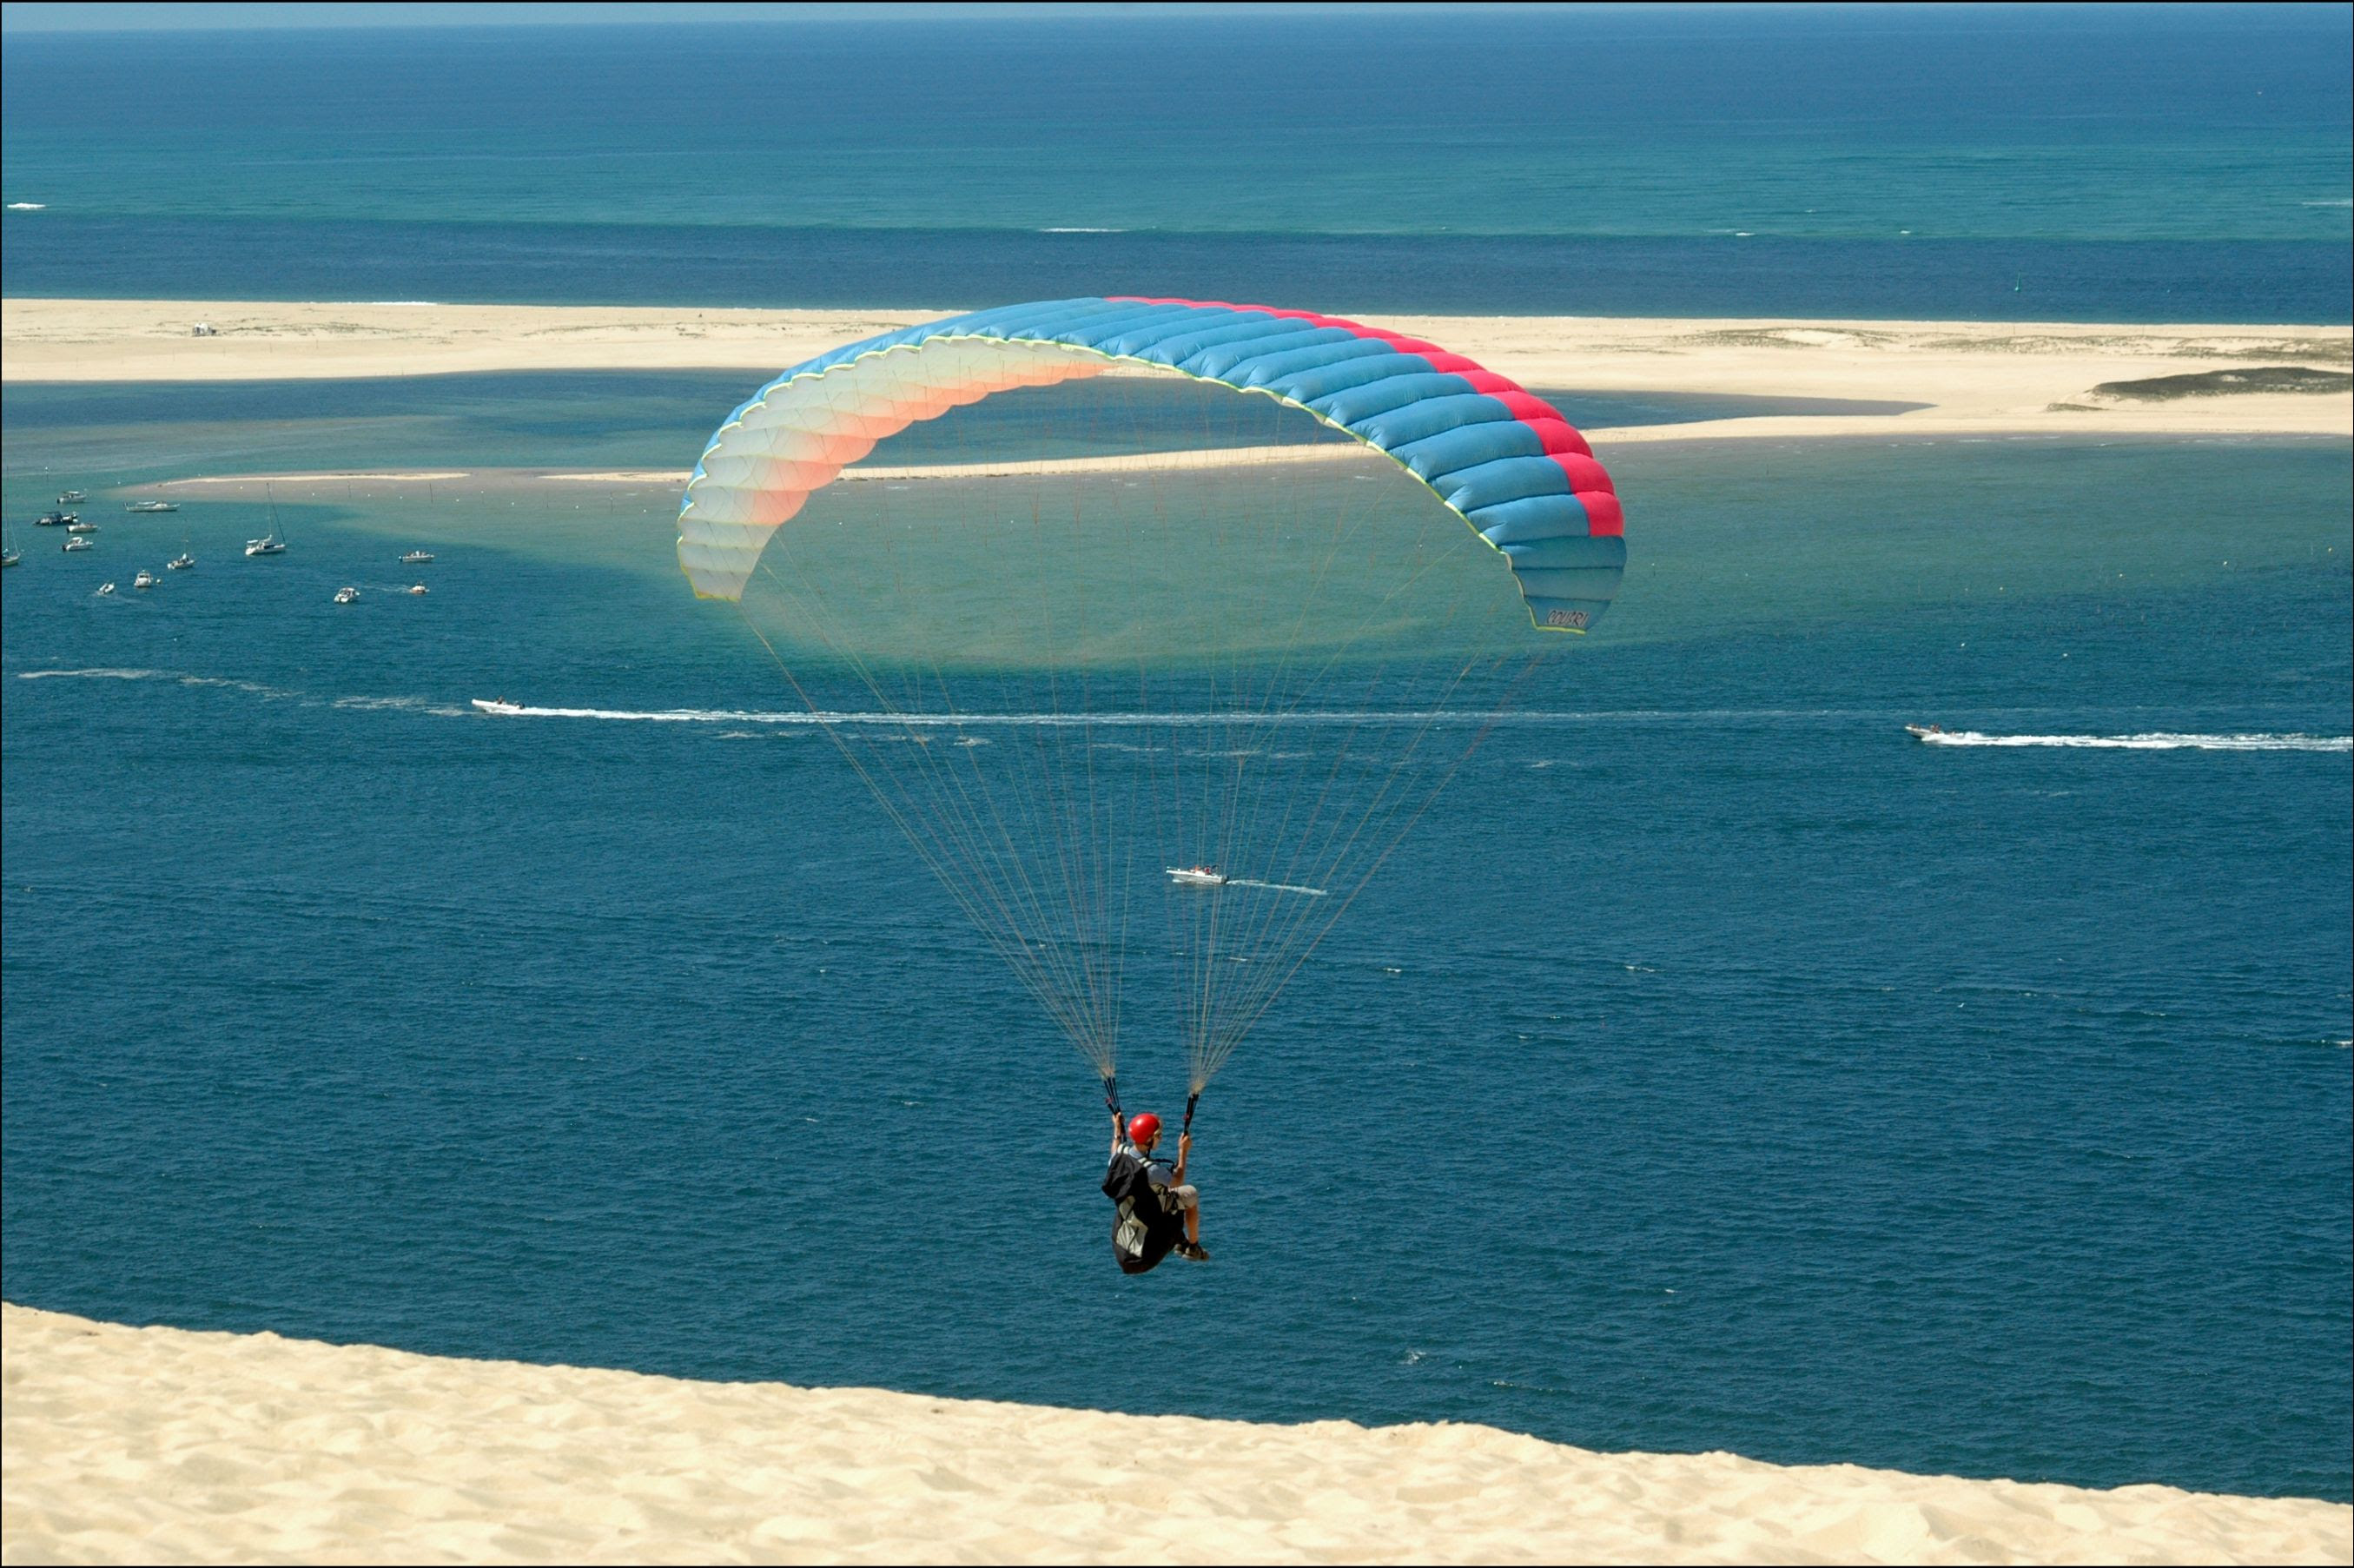 AaFN2 Dune de Pyla   A new Sahara desert being born   in France! [30 pics]